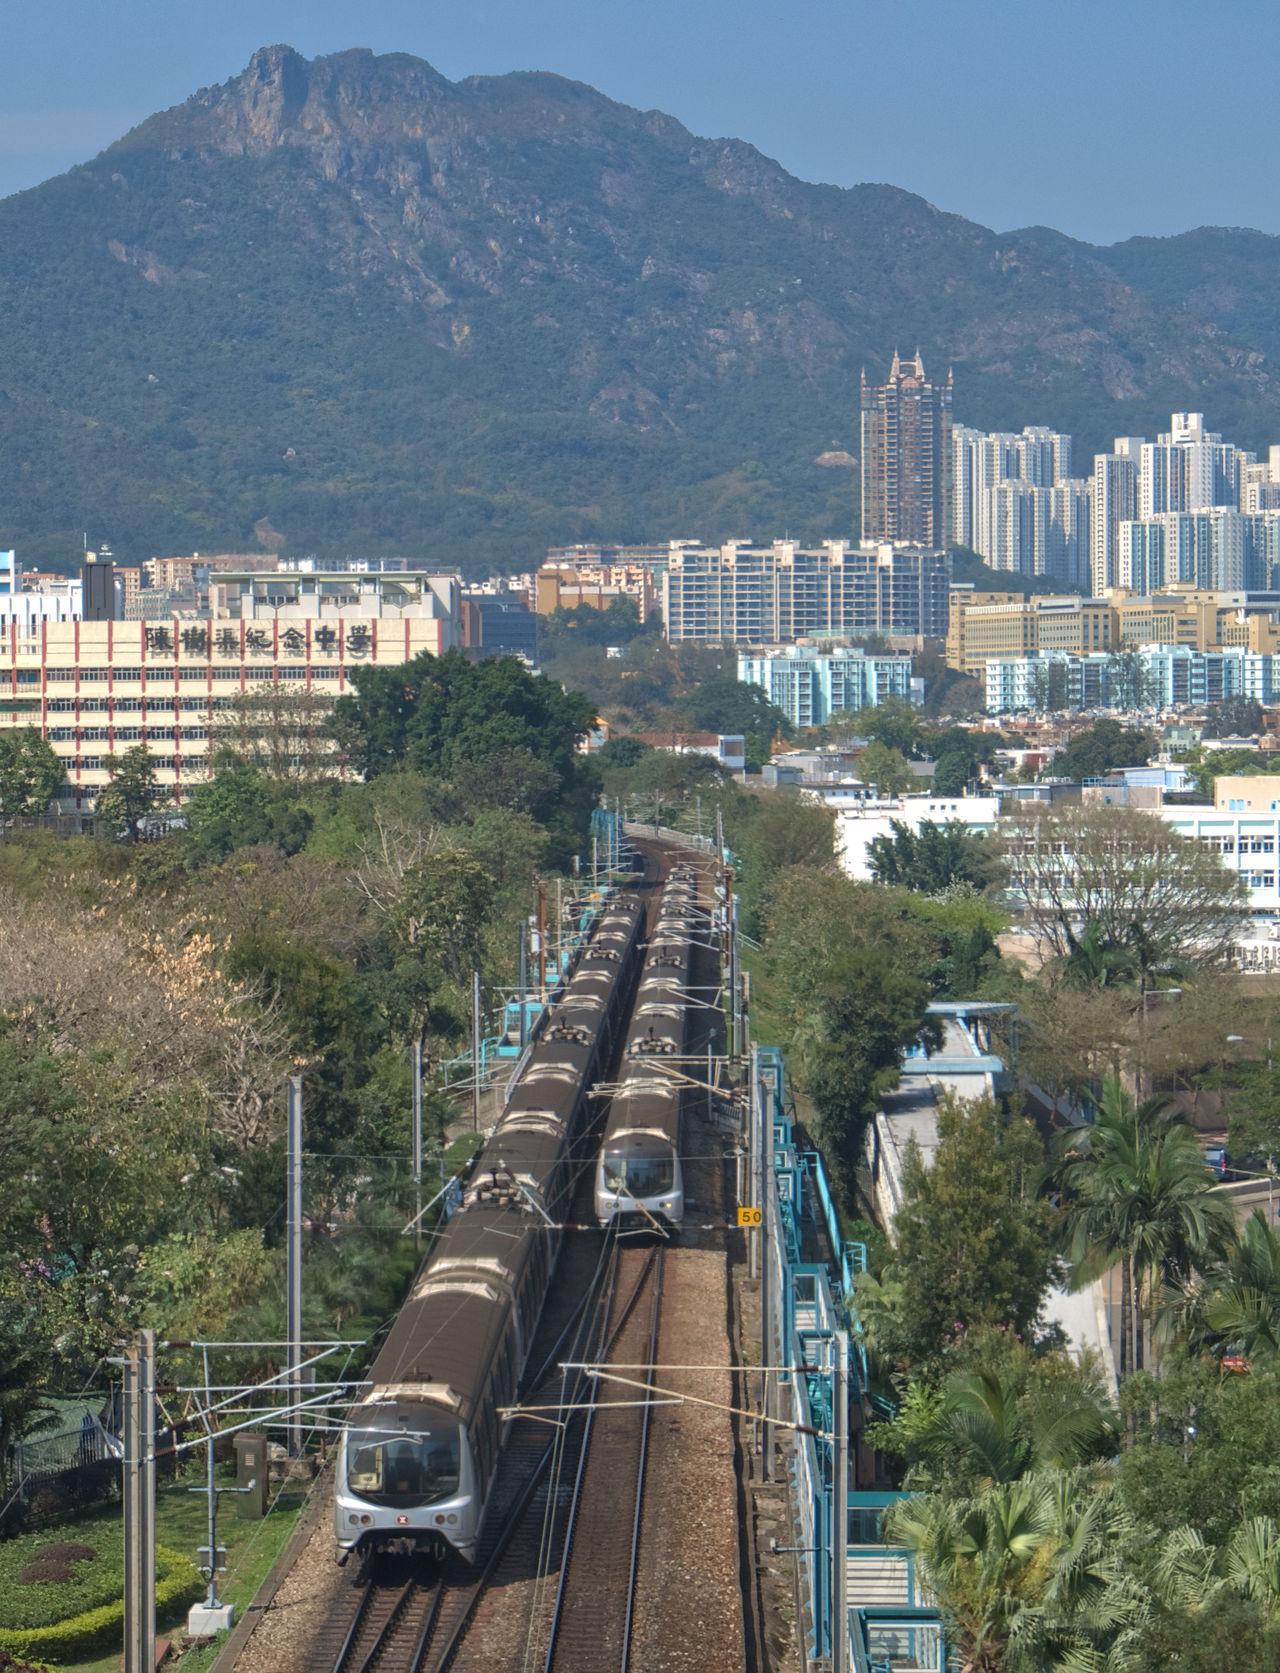 Lion Rock train Built Structure Cityscape DSLR Dslrphotography High Angle View HongKong Pentax Train Train - Vehicle Train Tracks Trains Transportation